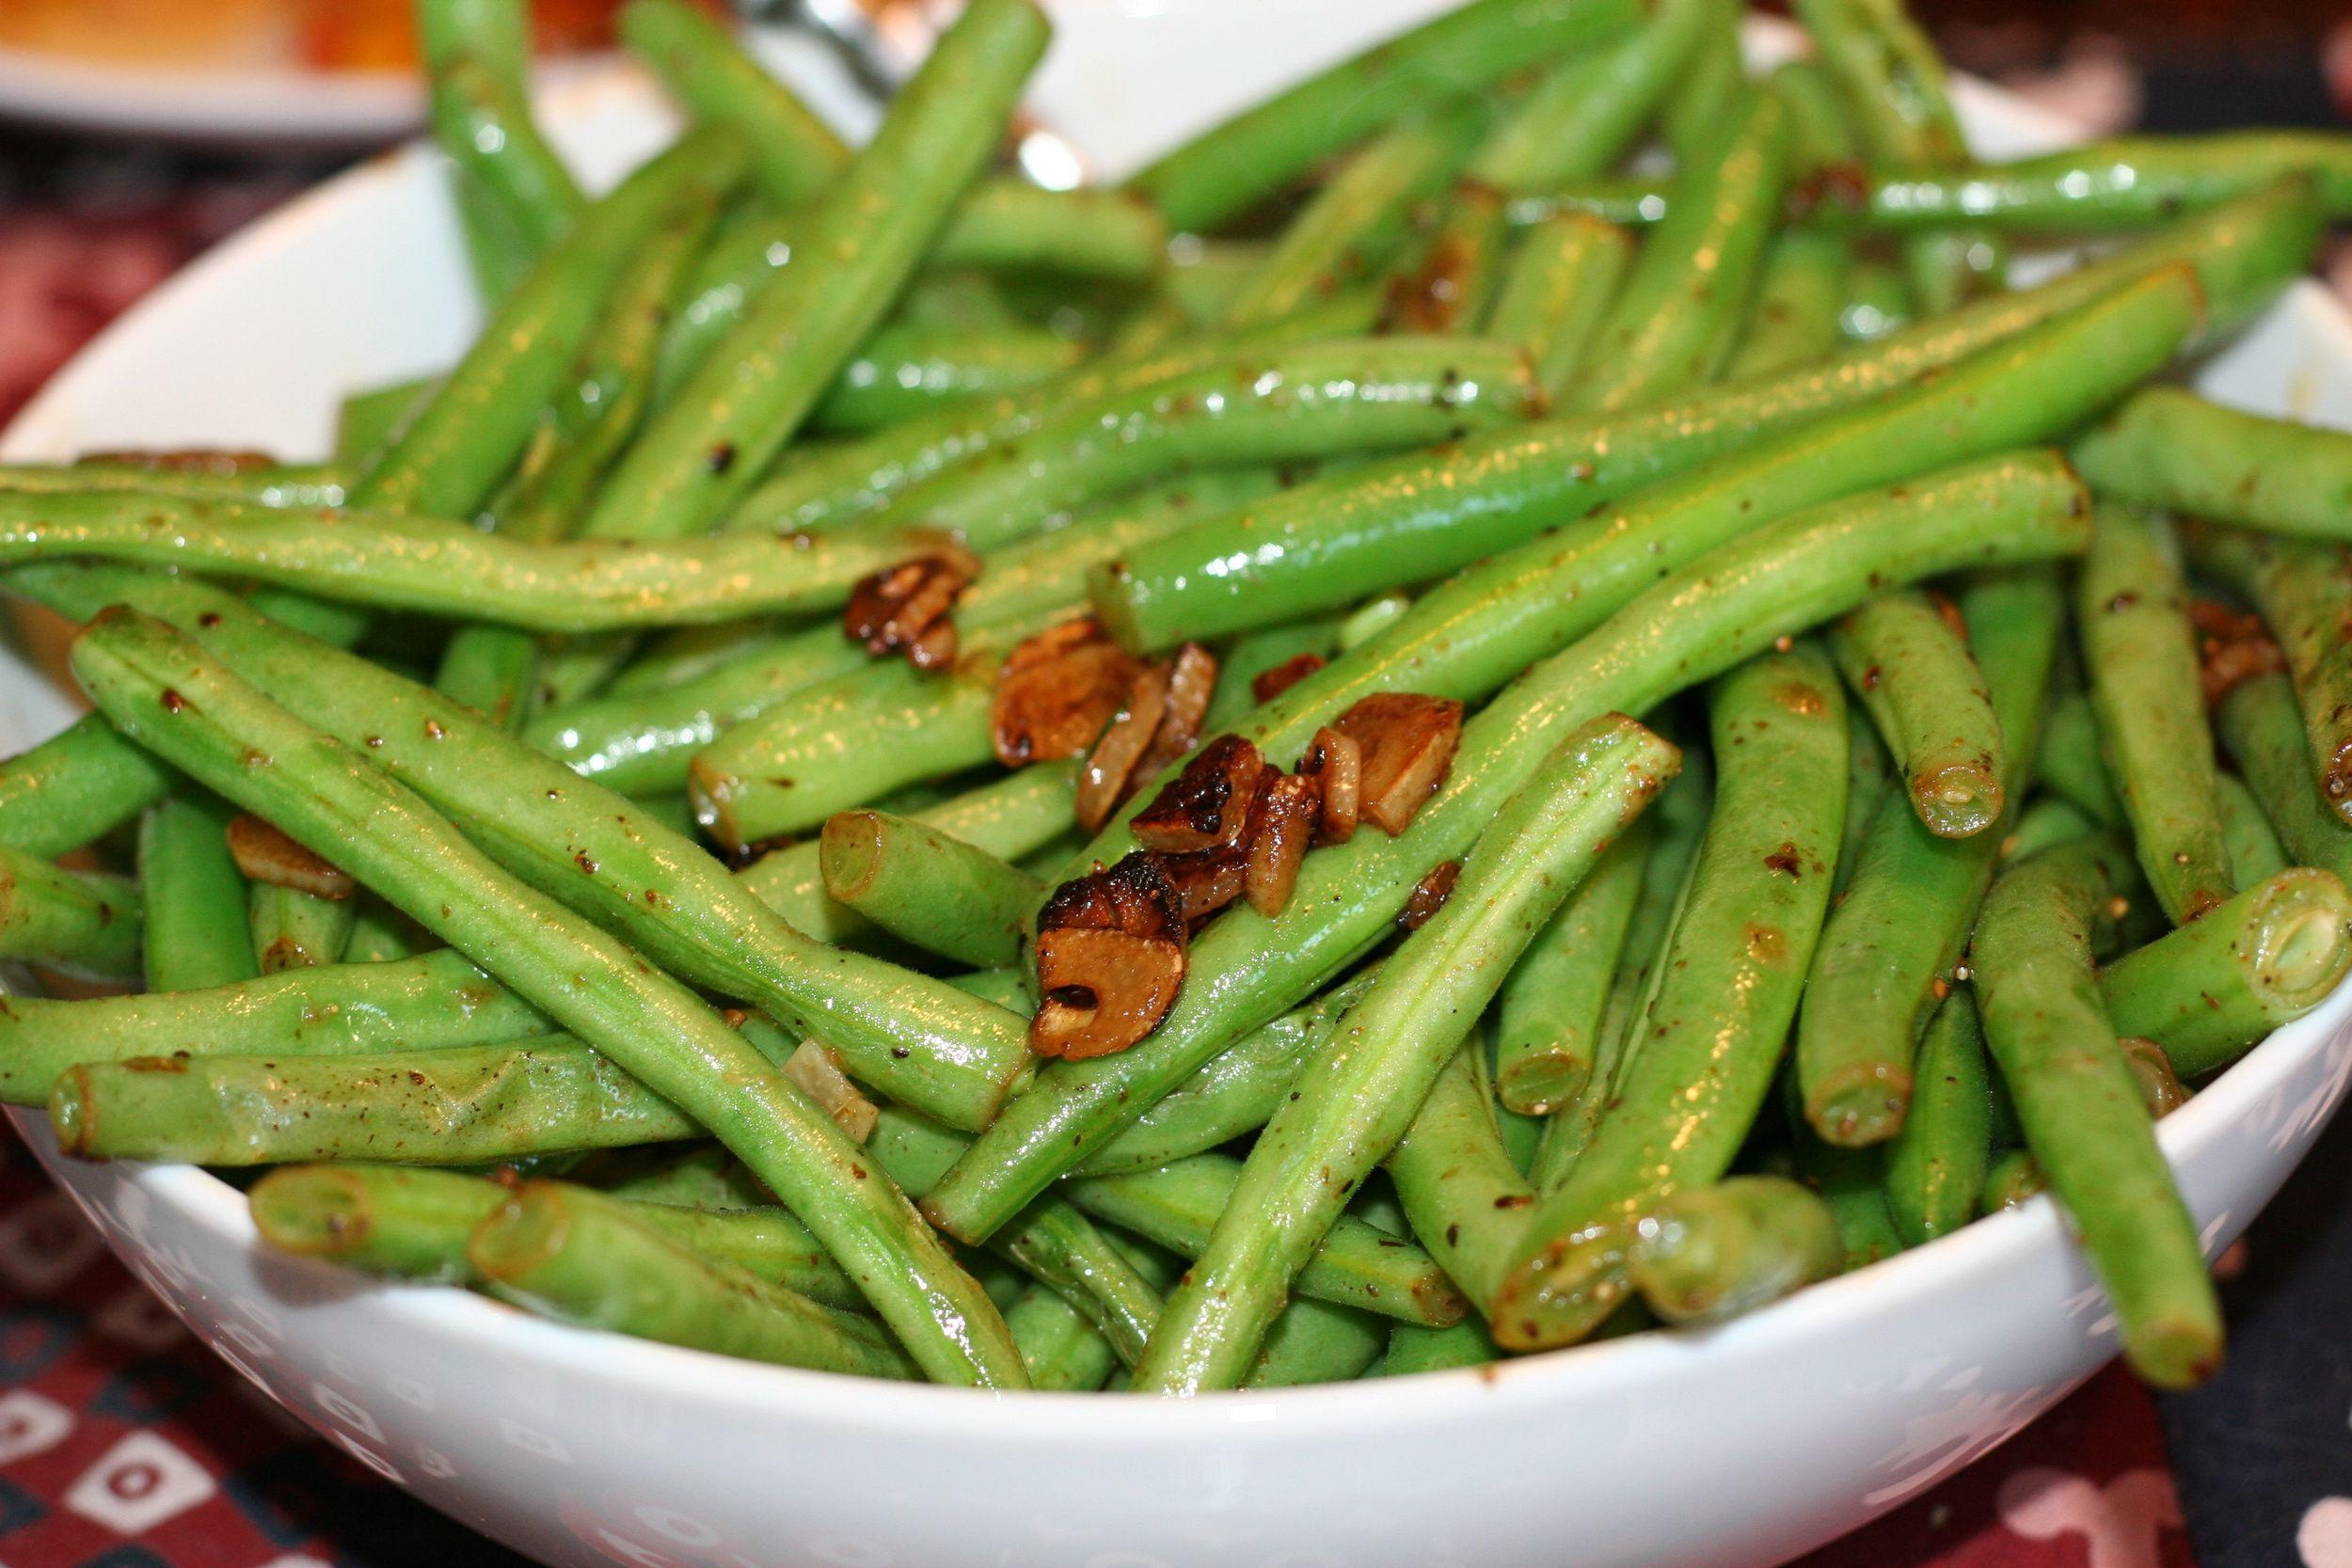 greenbeansgarlic